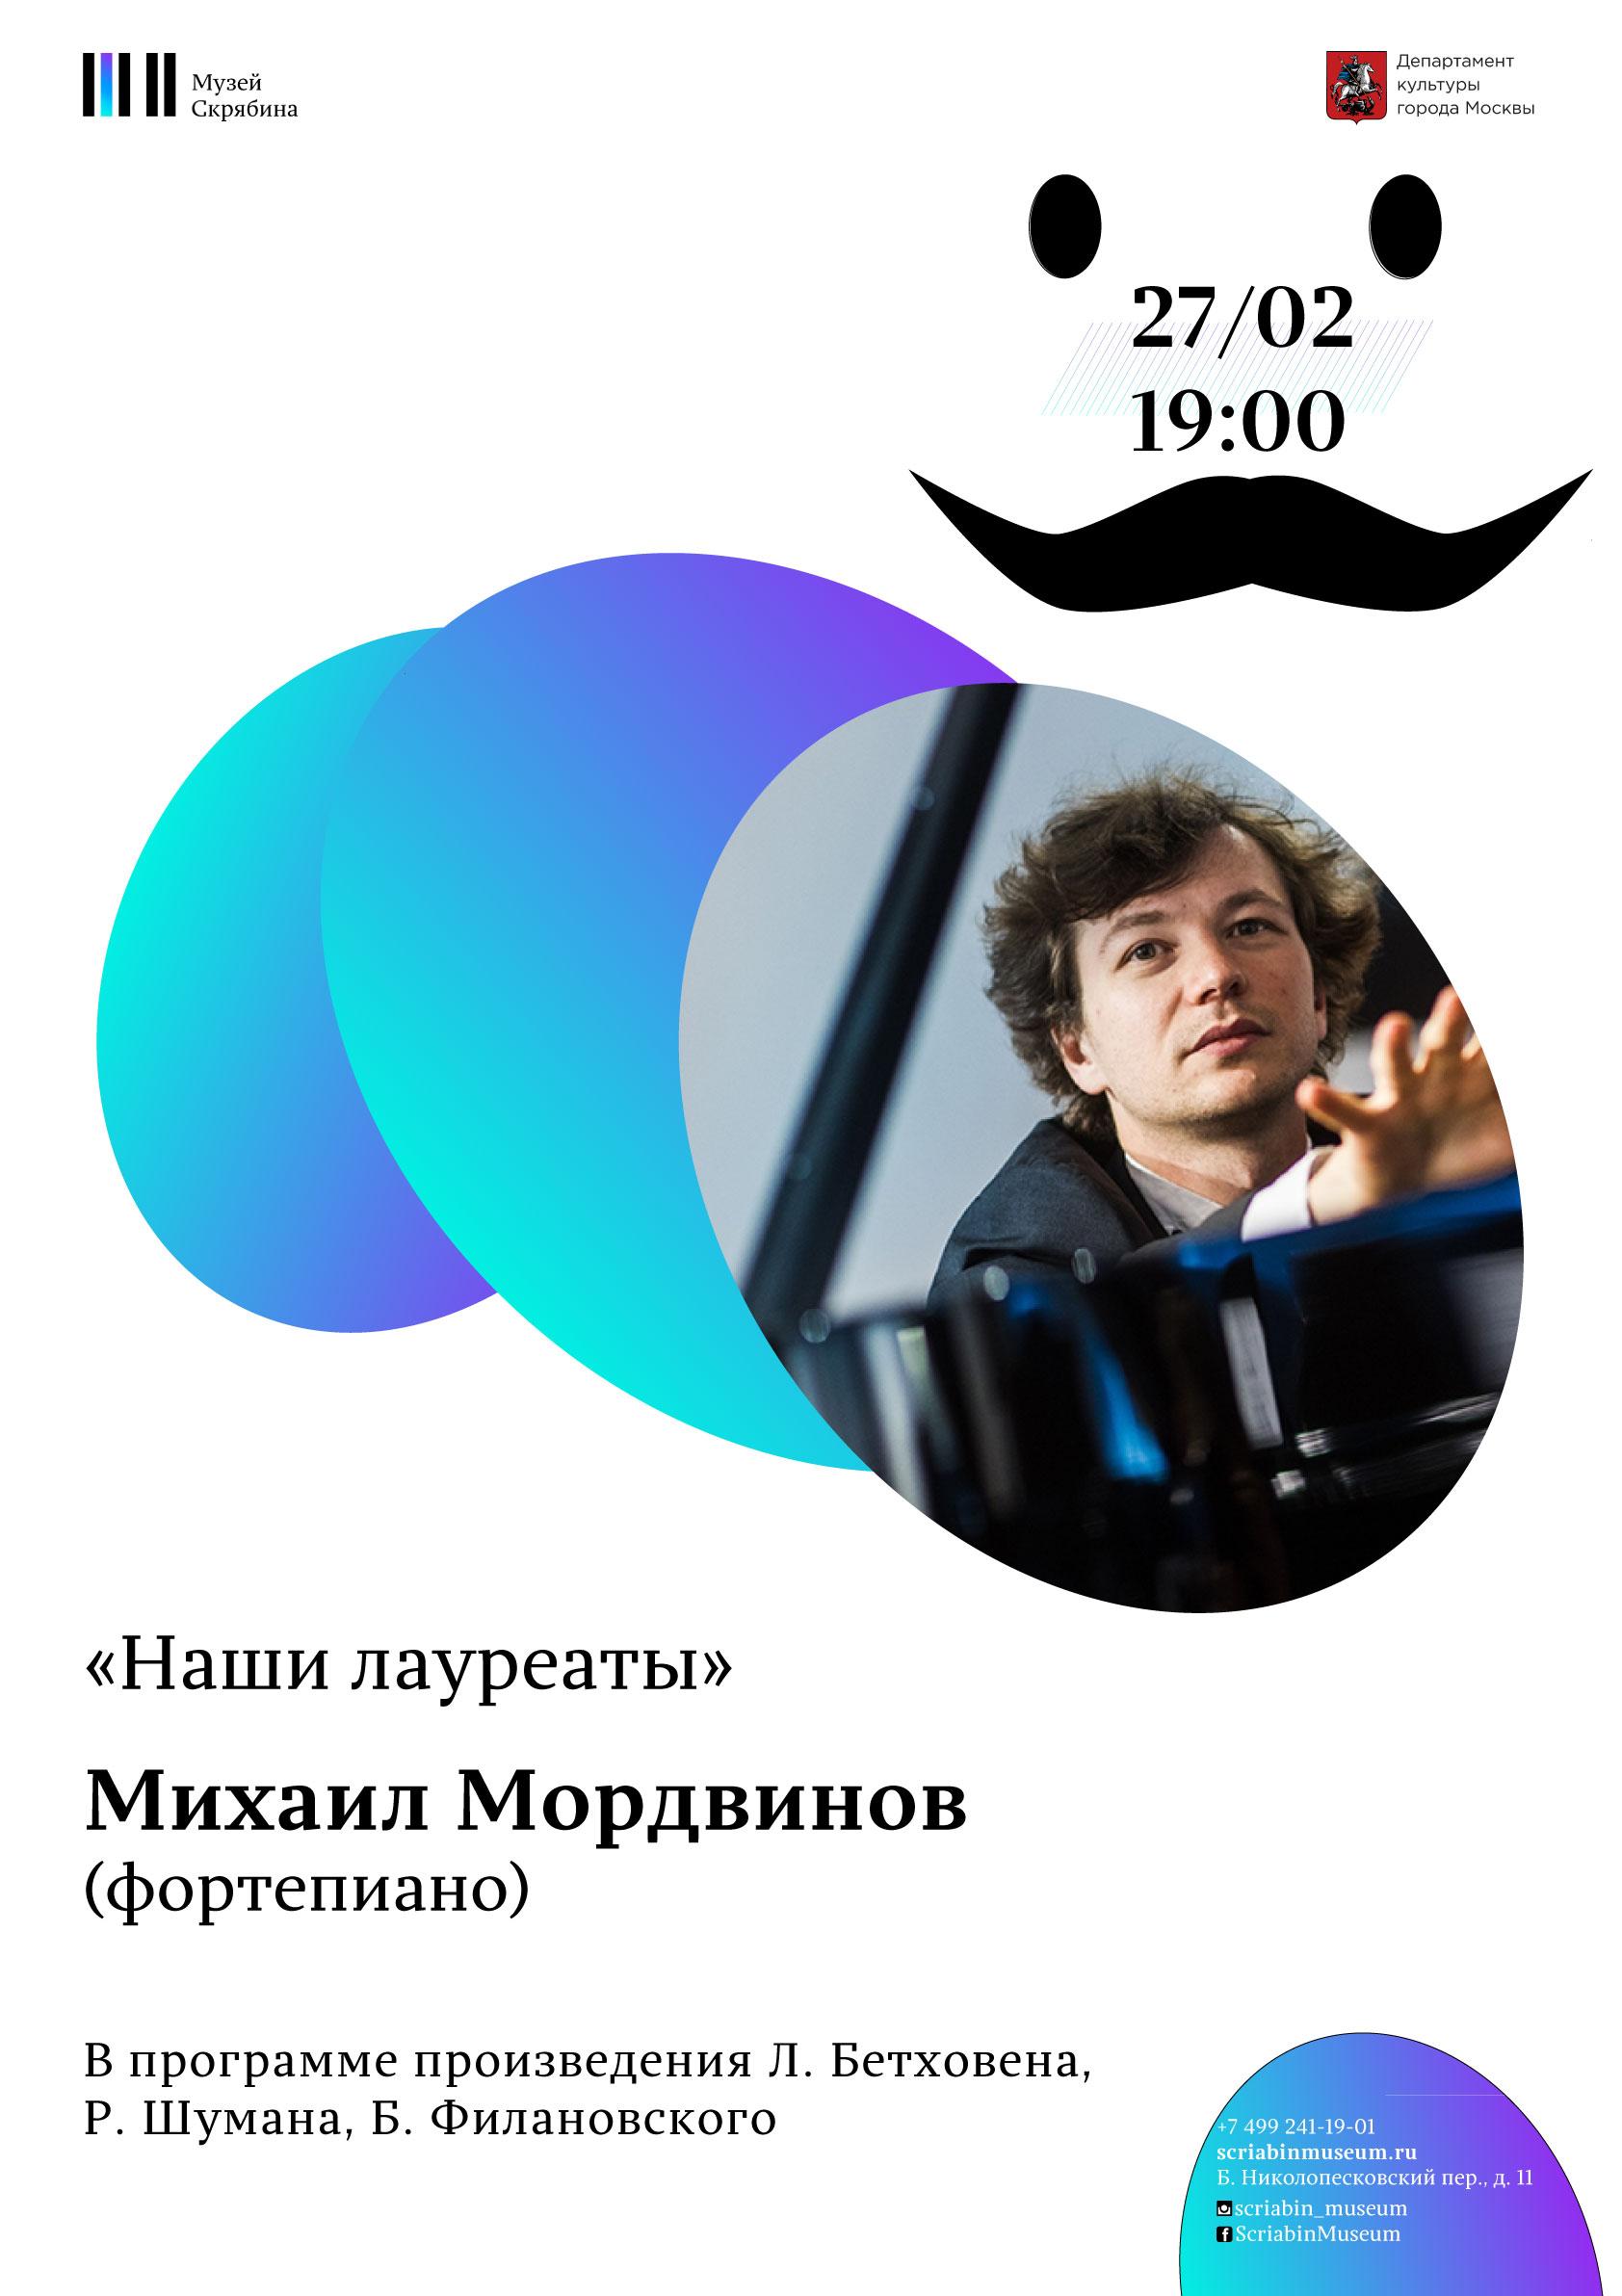 Фортепиано Концерт Михаила Мордвинова